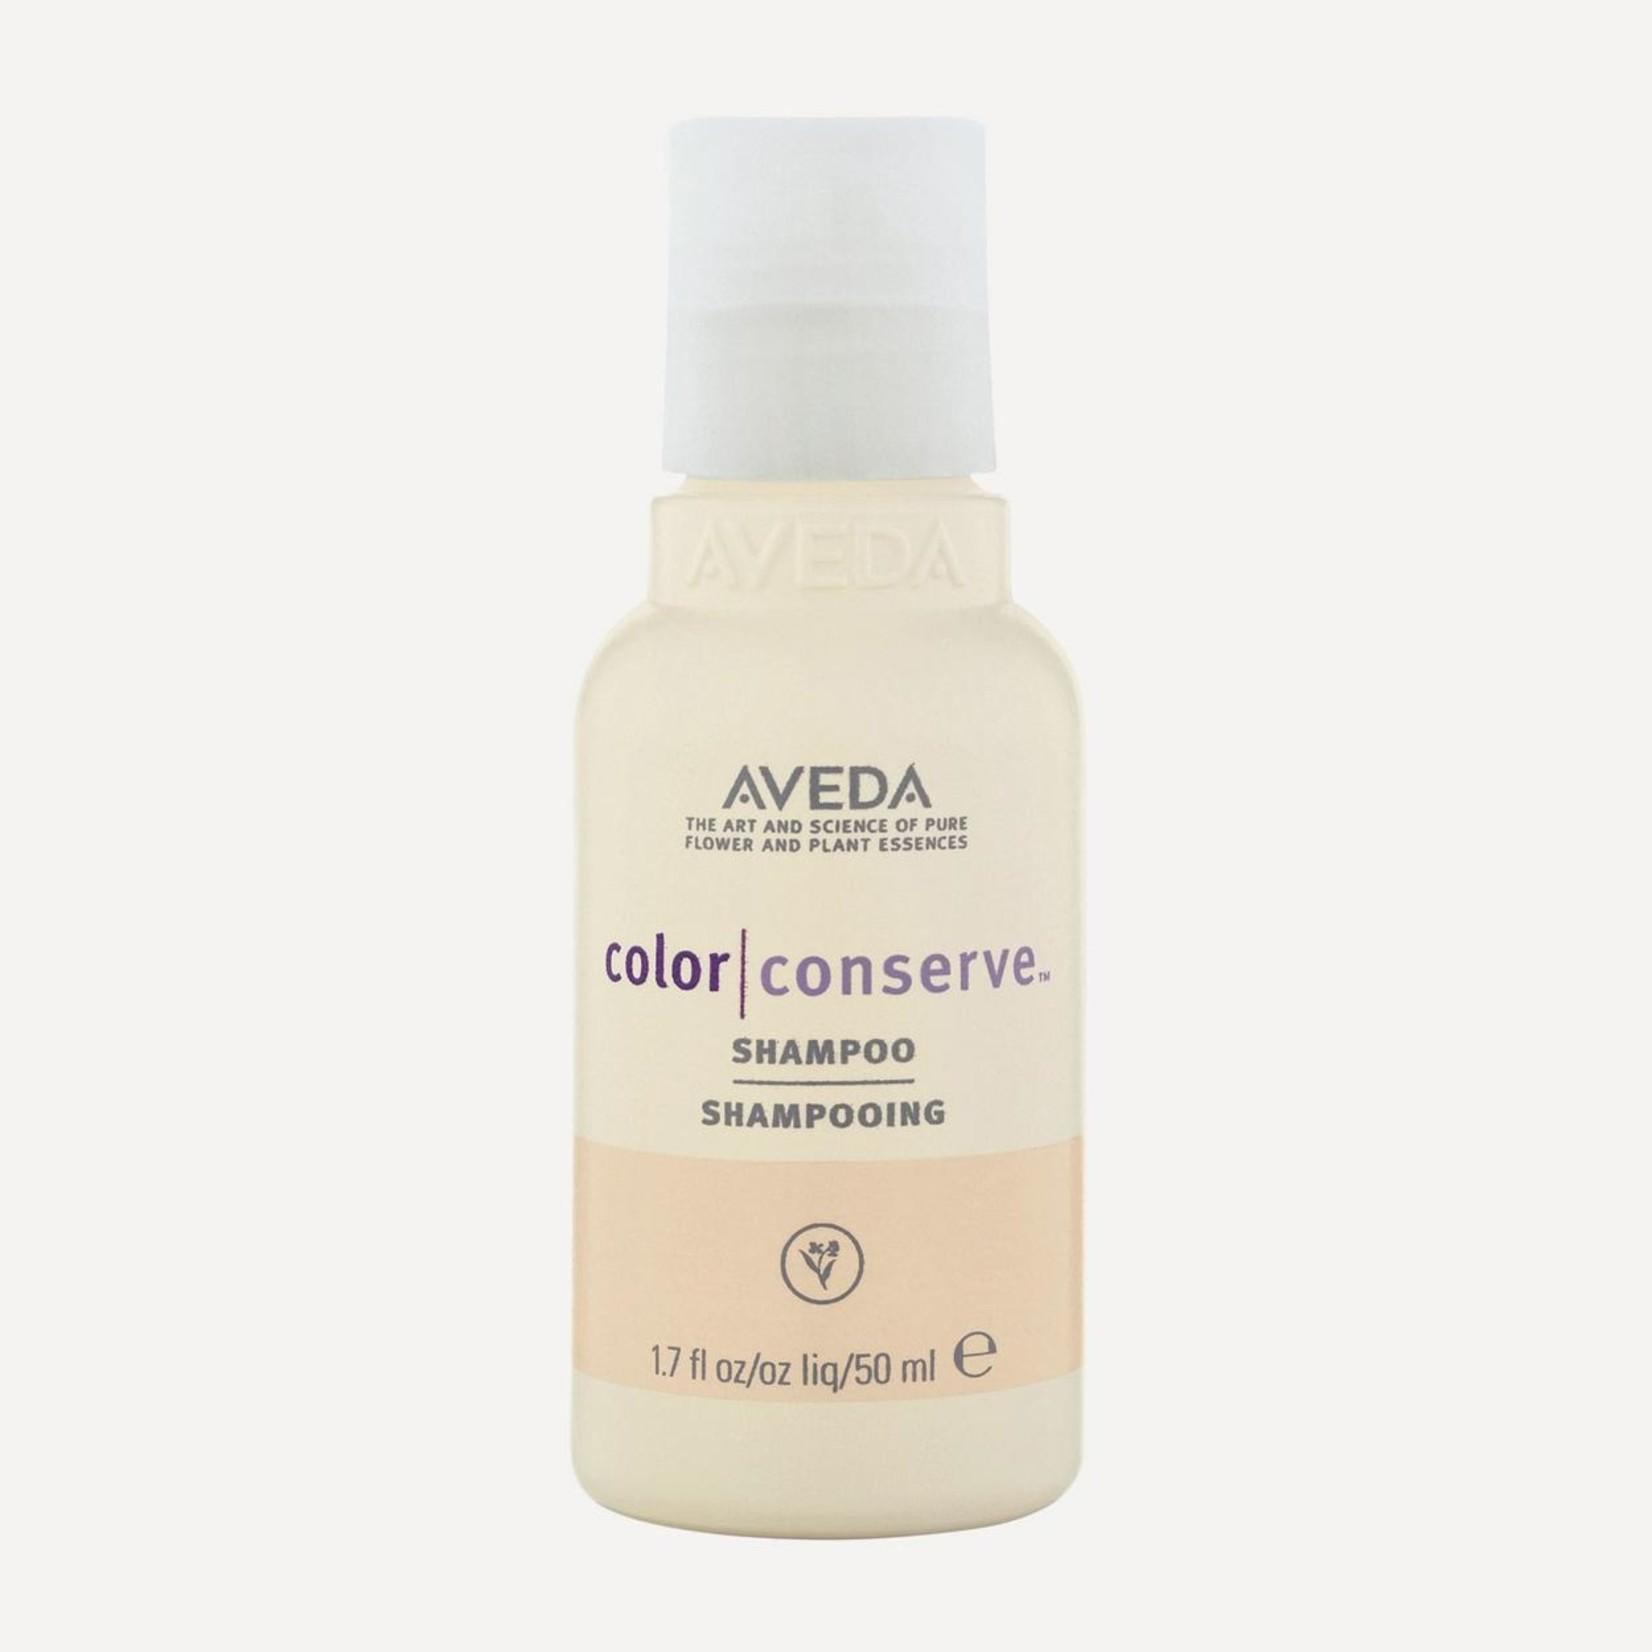 AVEDA Color Conserve™ Shampoo